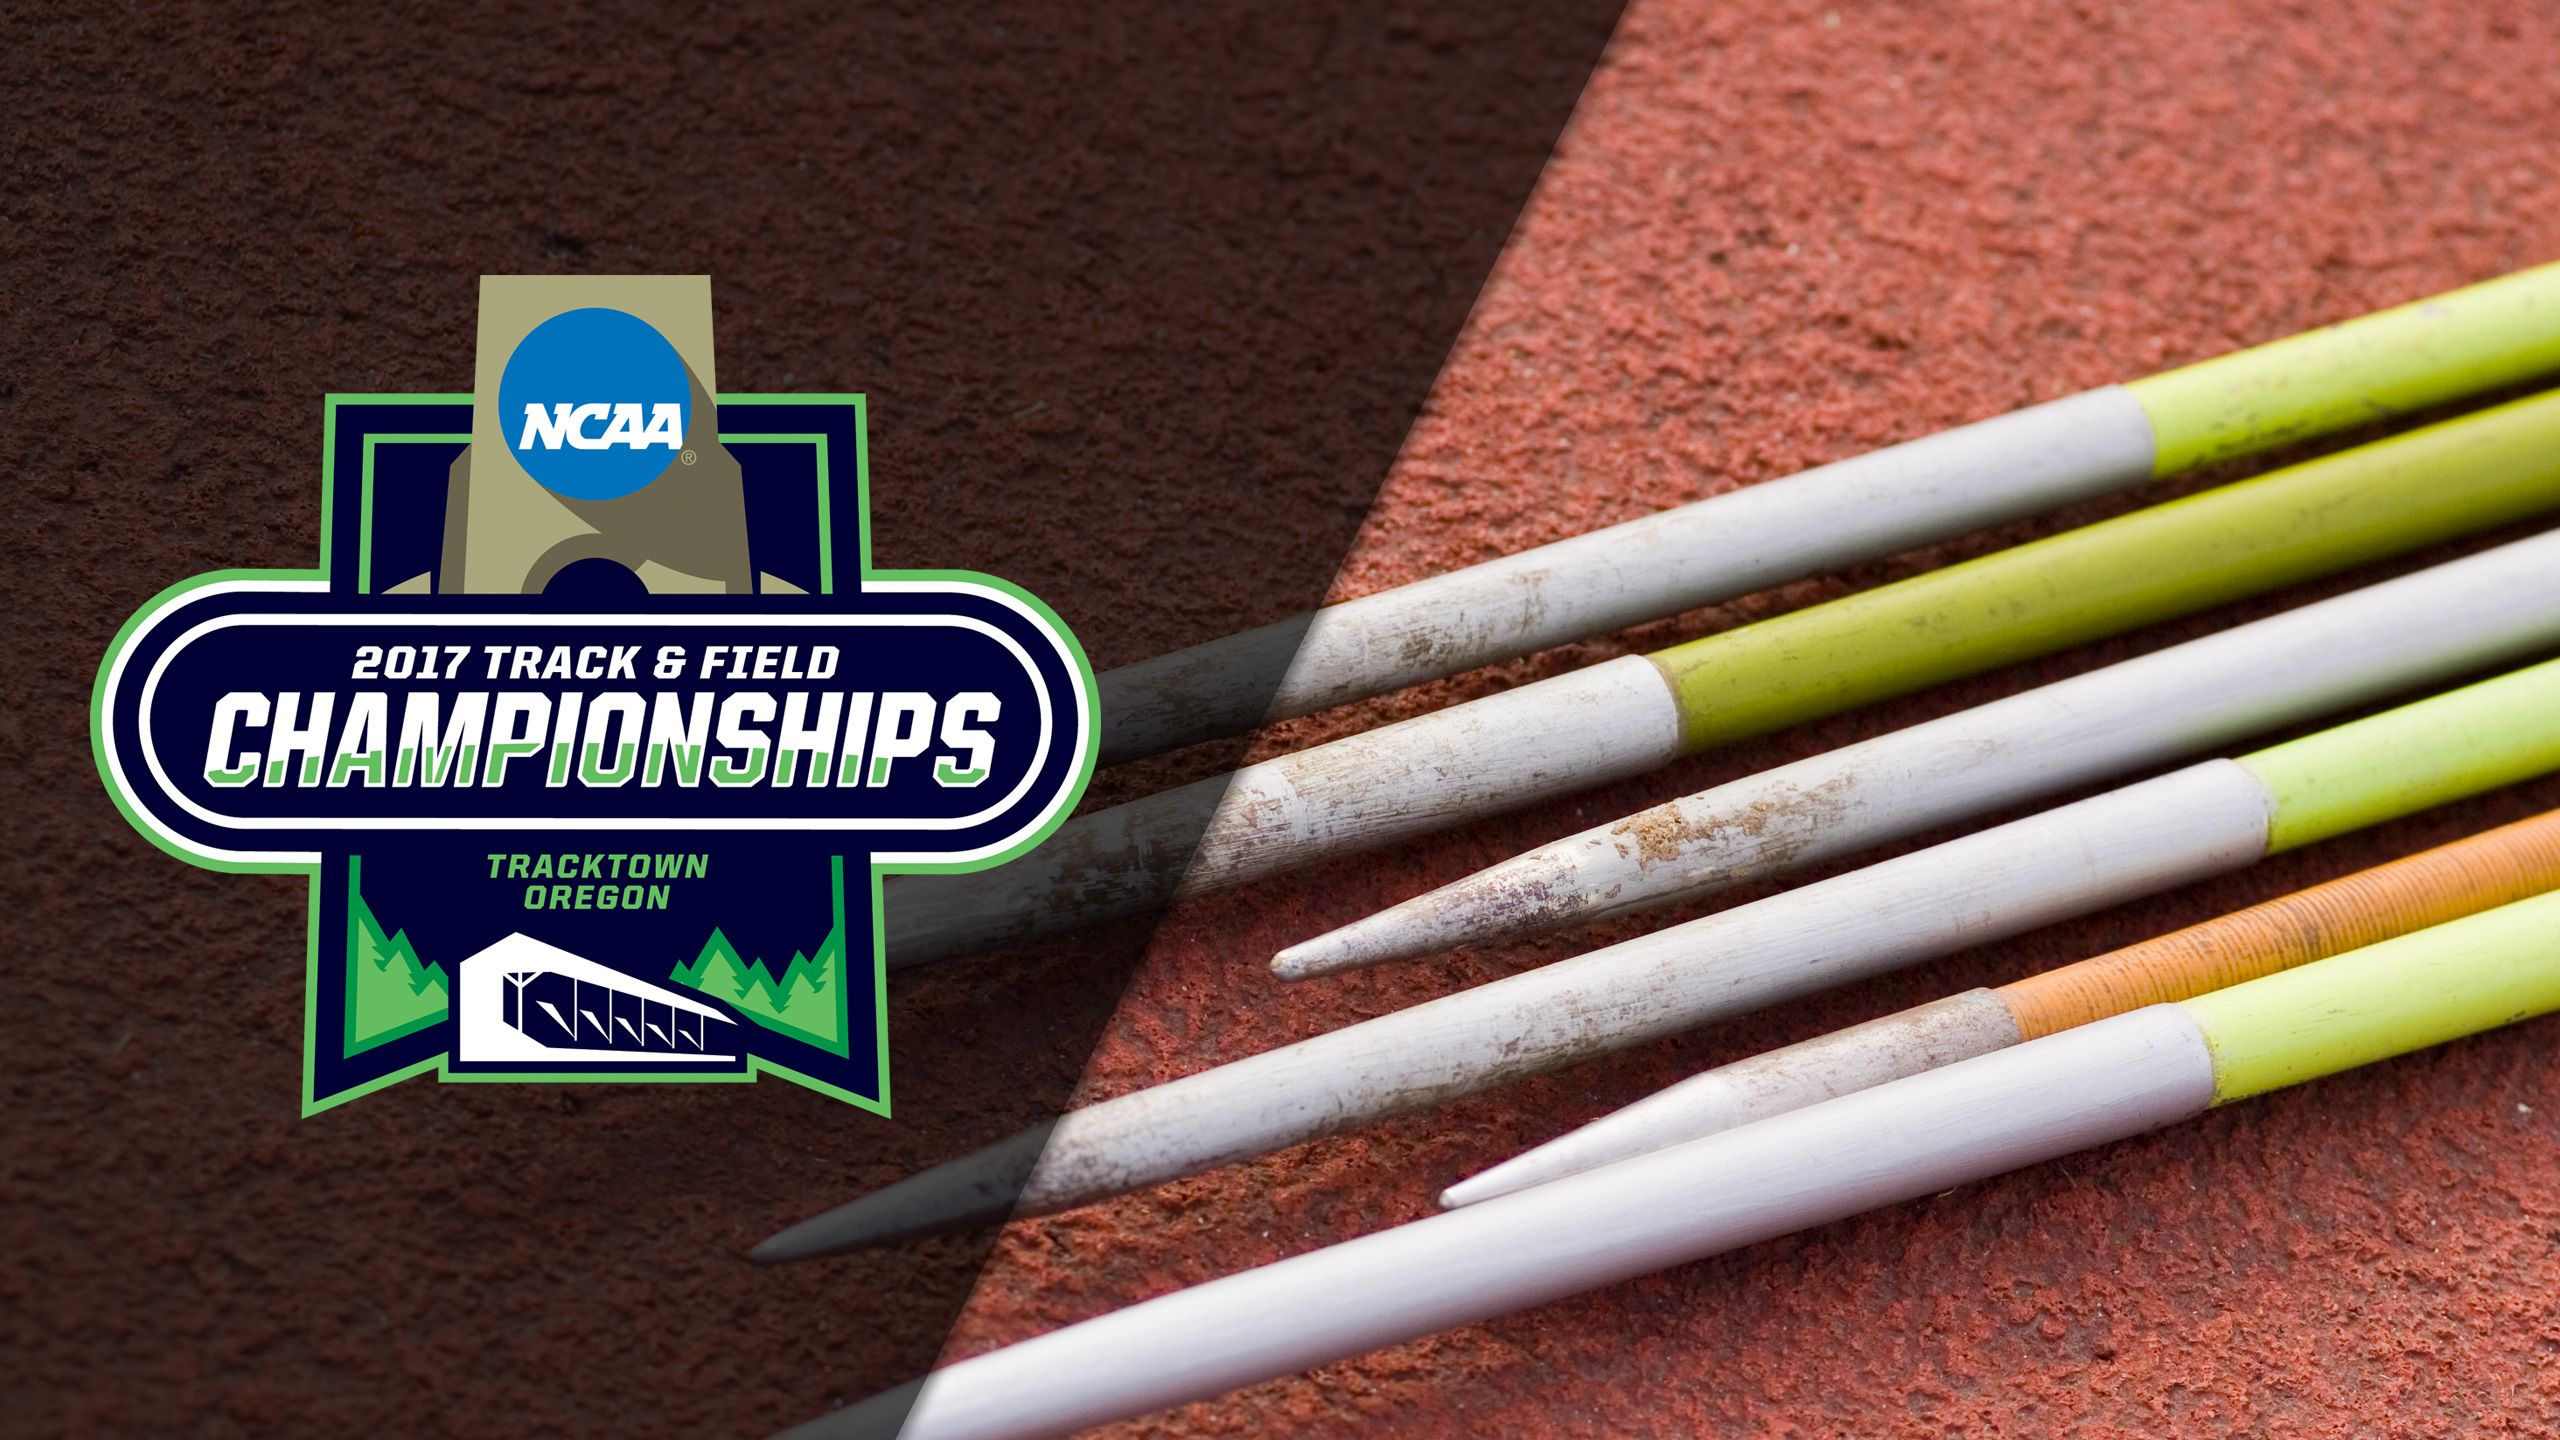 NCAA Track & Field Outdoor Championships - Women's Javelin Throw Final